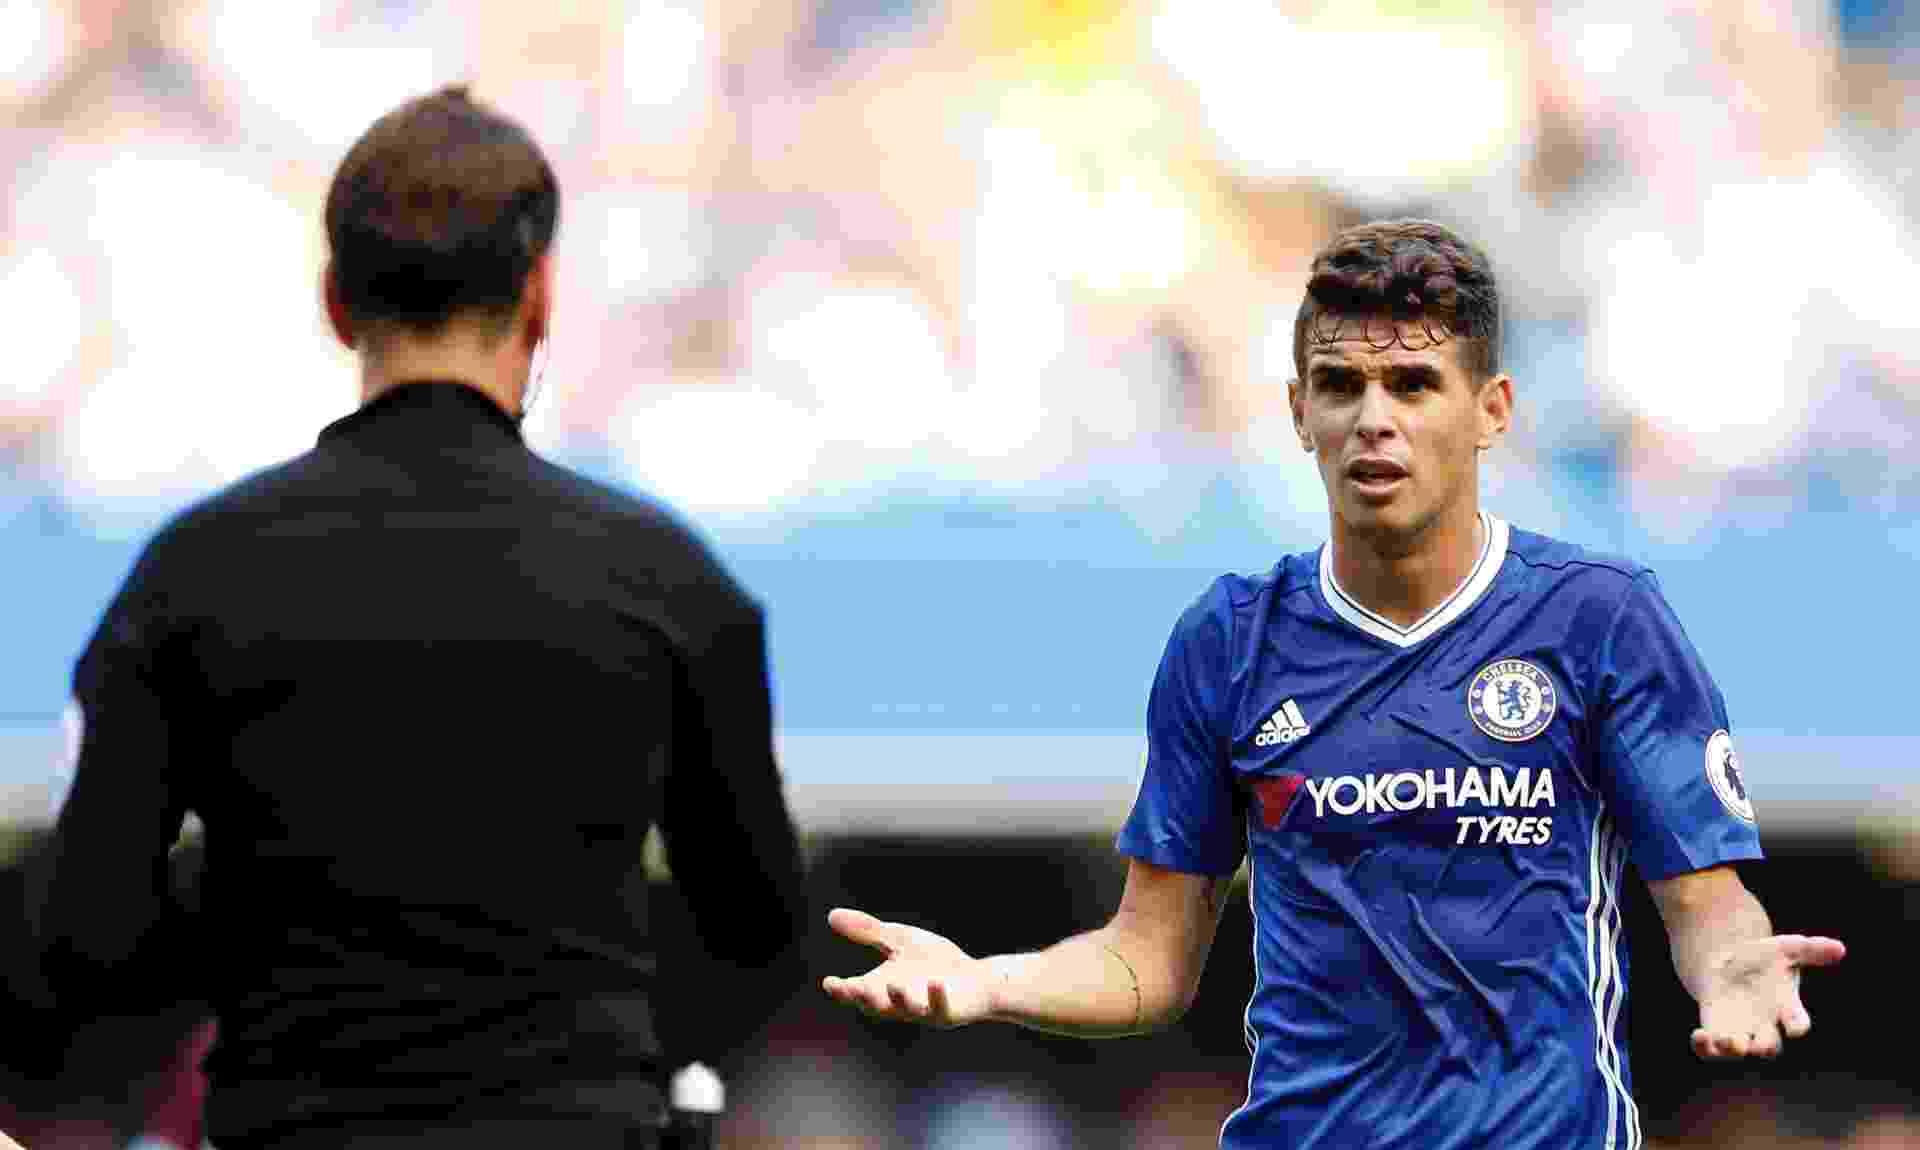 Oscar durante jogo do Chelsea pelo Campeonato Inglês - Andrew Couldridge Livepic/Reuters